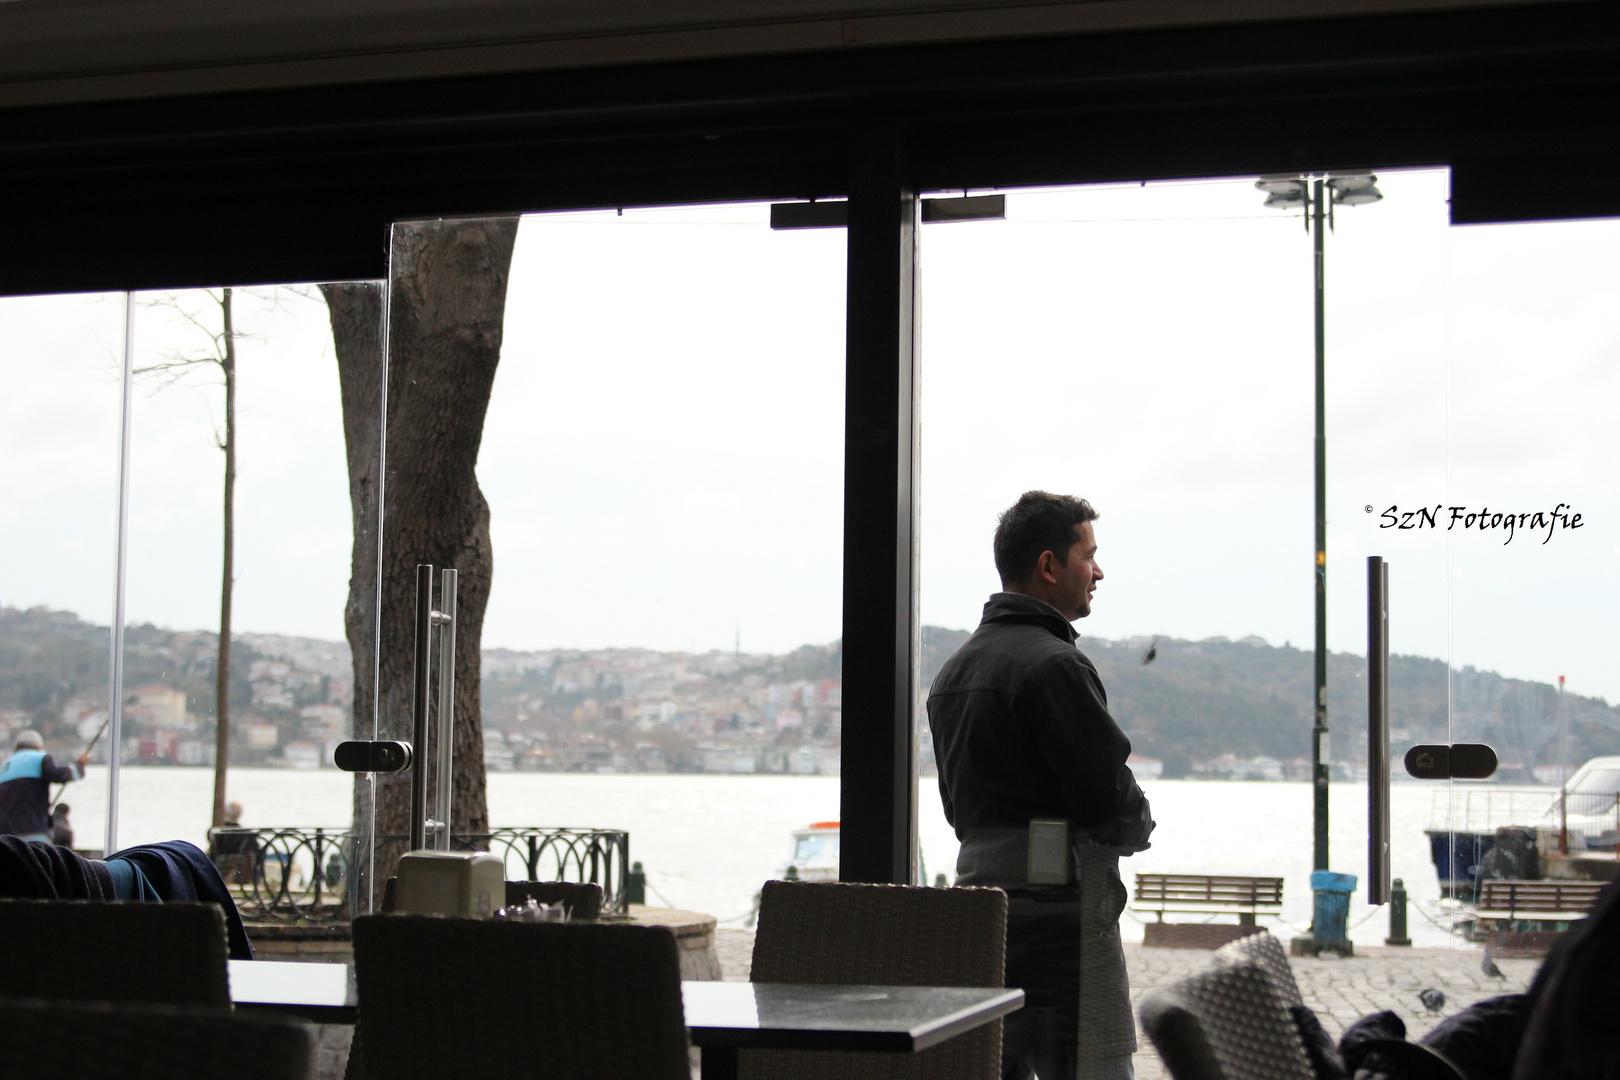 Café a la istanBooL